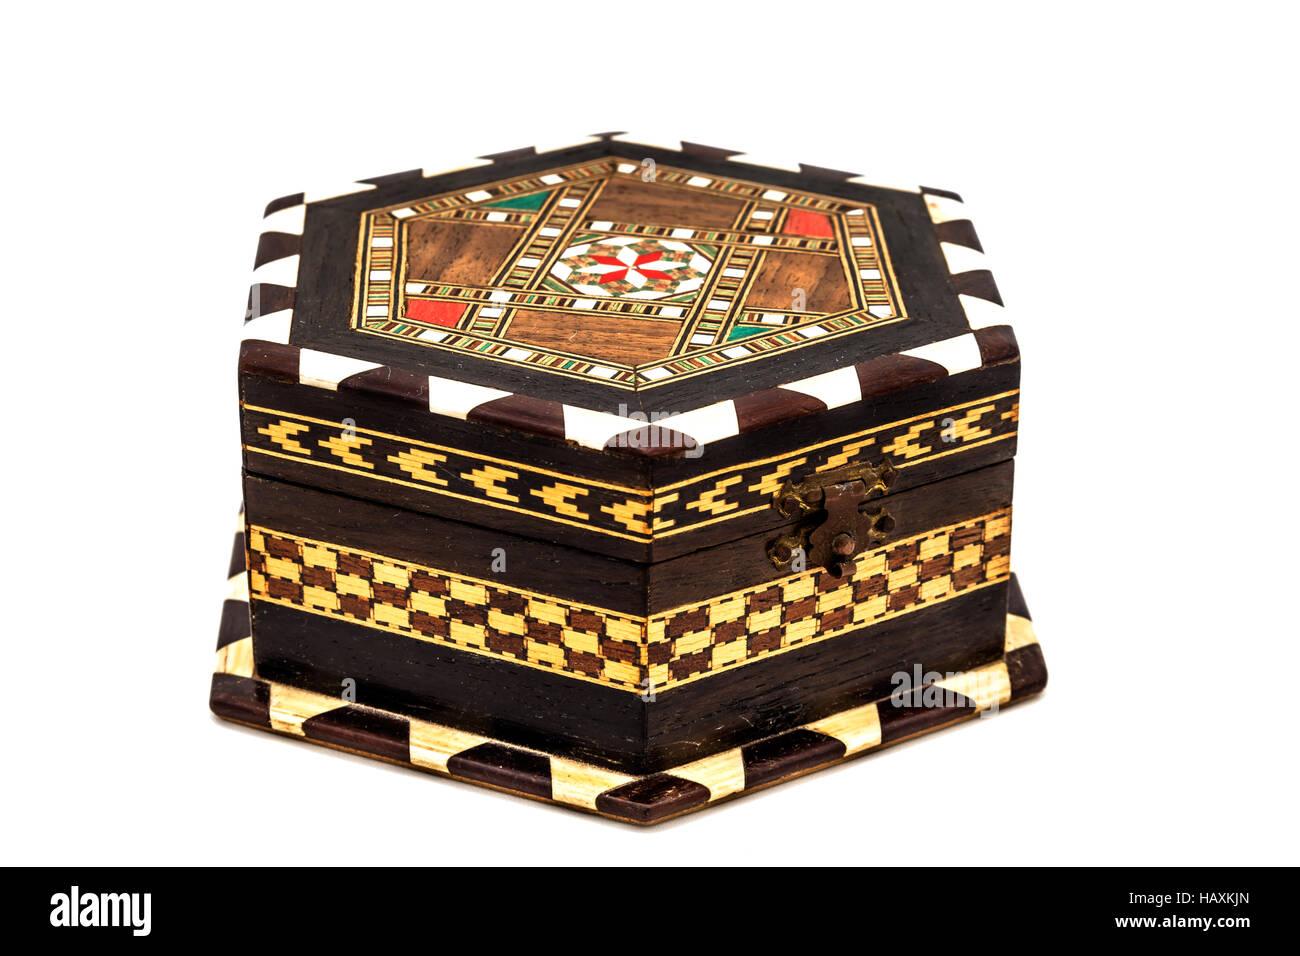 Vintage jewel box - Stock Image